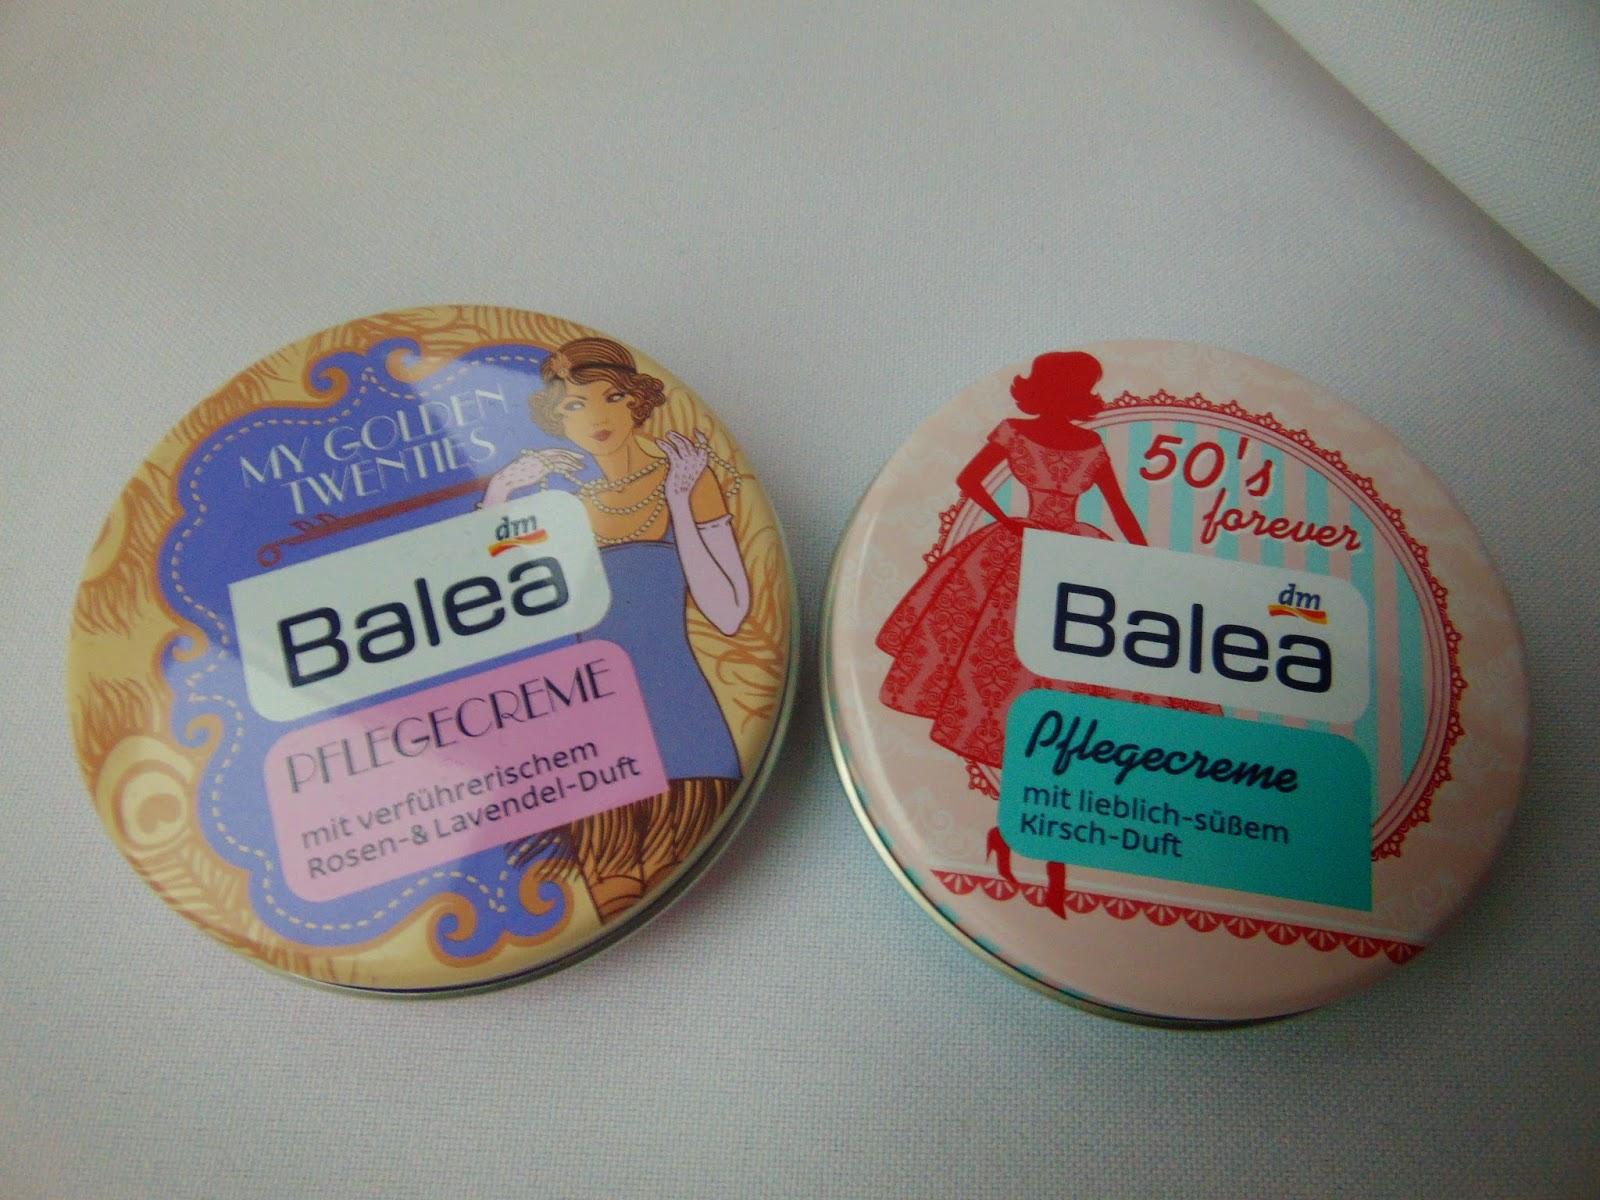 Balea Pflegecremes - www.annitschkasblog.de